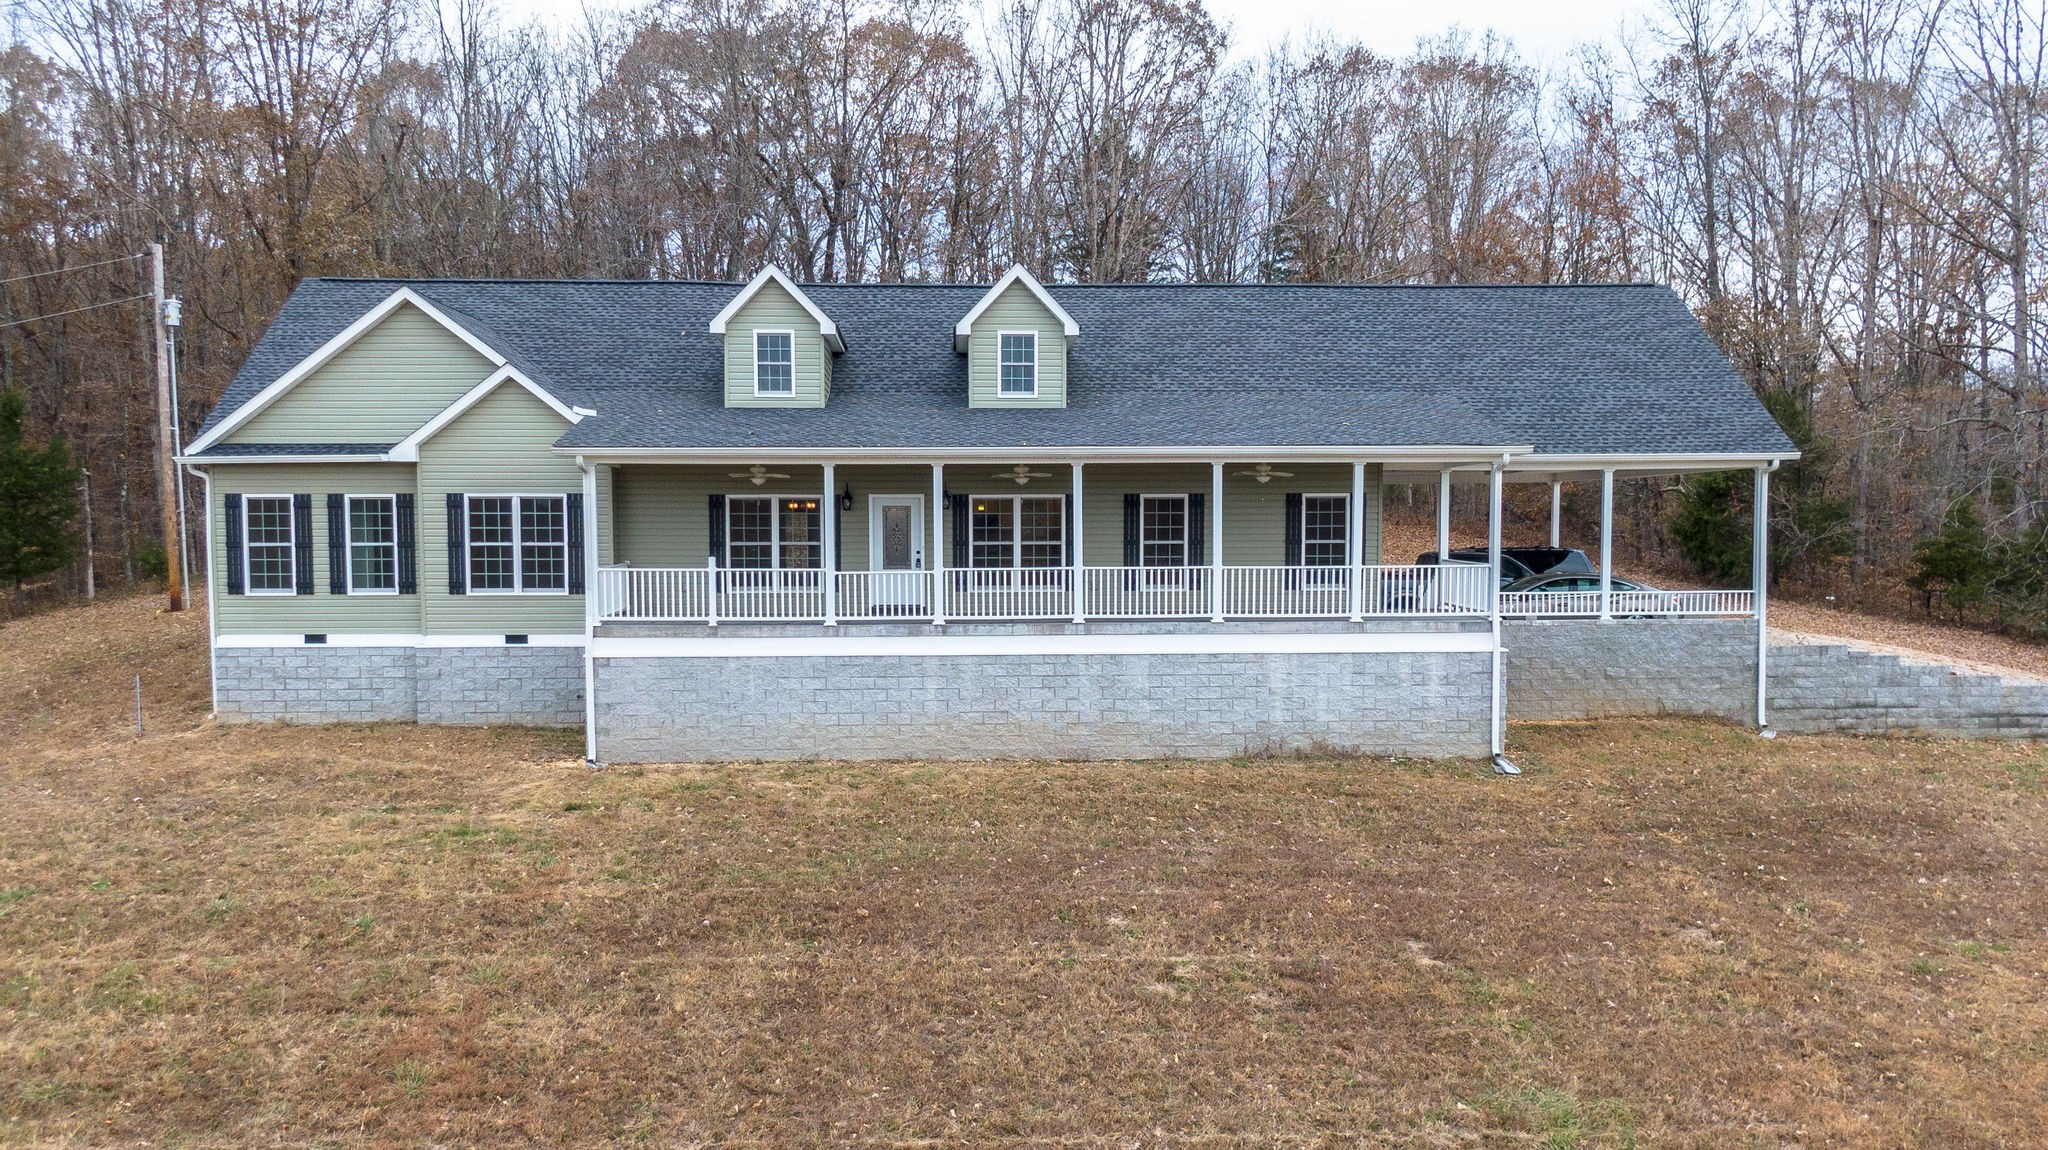 2172 Garners Creek Rd, Dickson, TN 37055 - Dickson, TN real estate listing